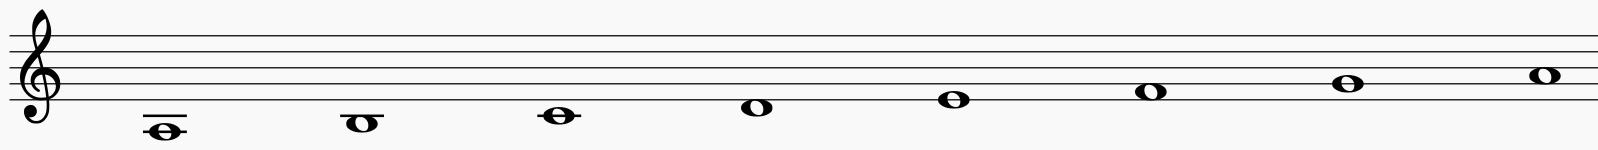 minorcode_aminor